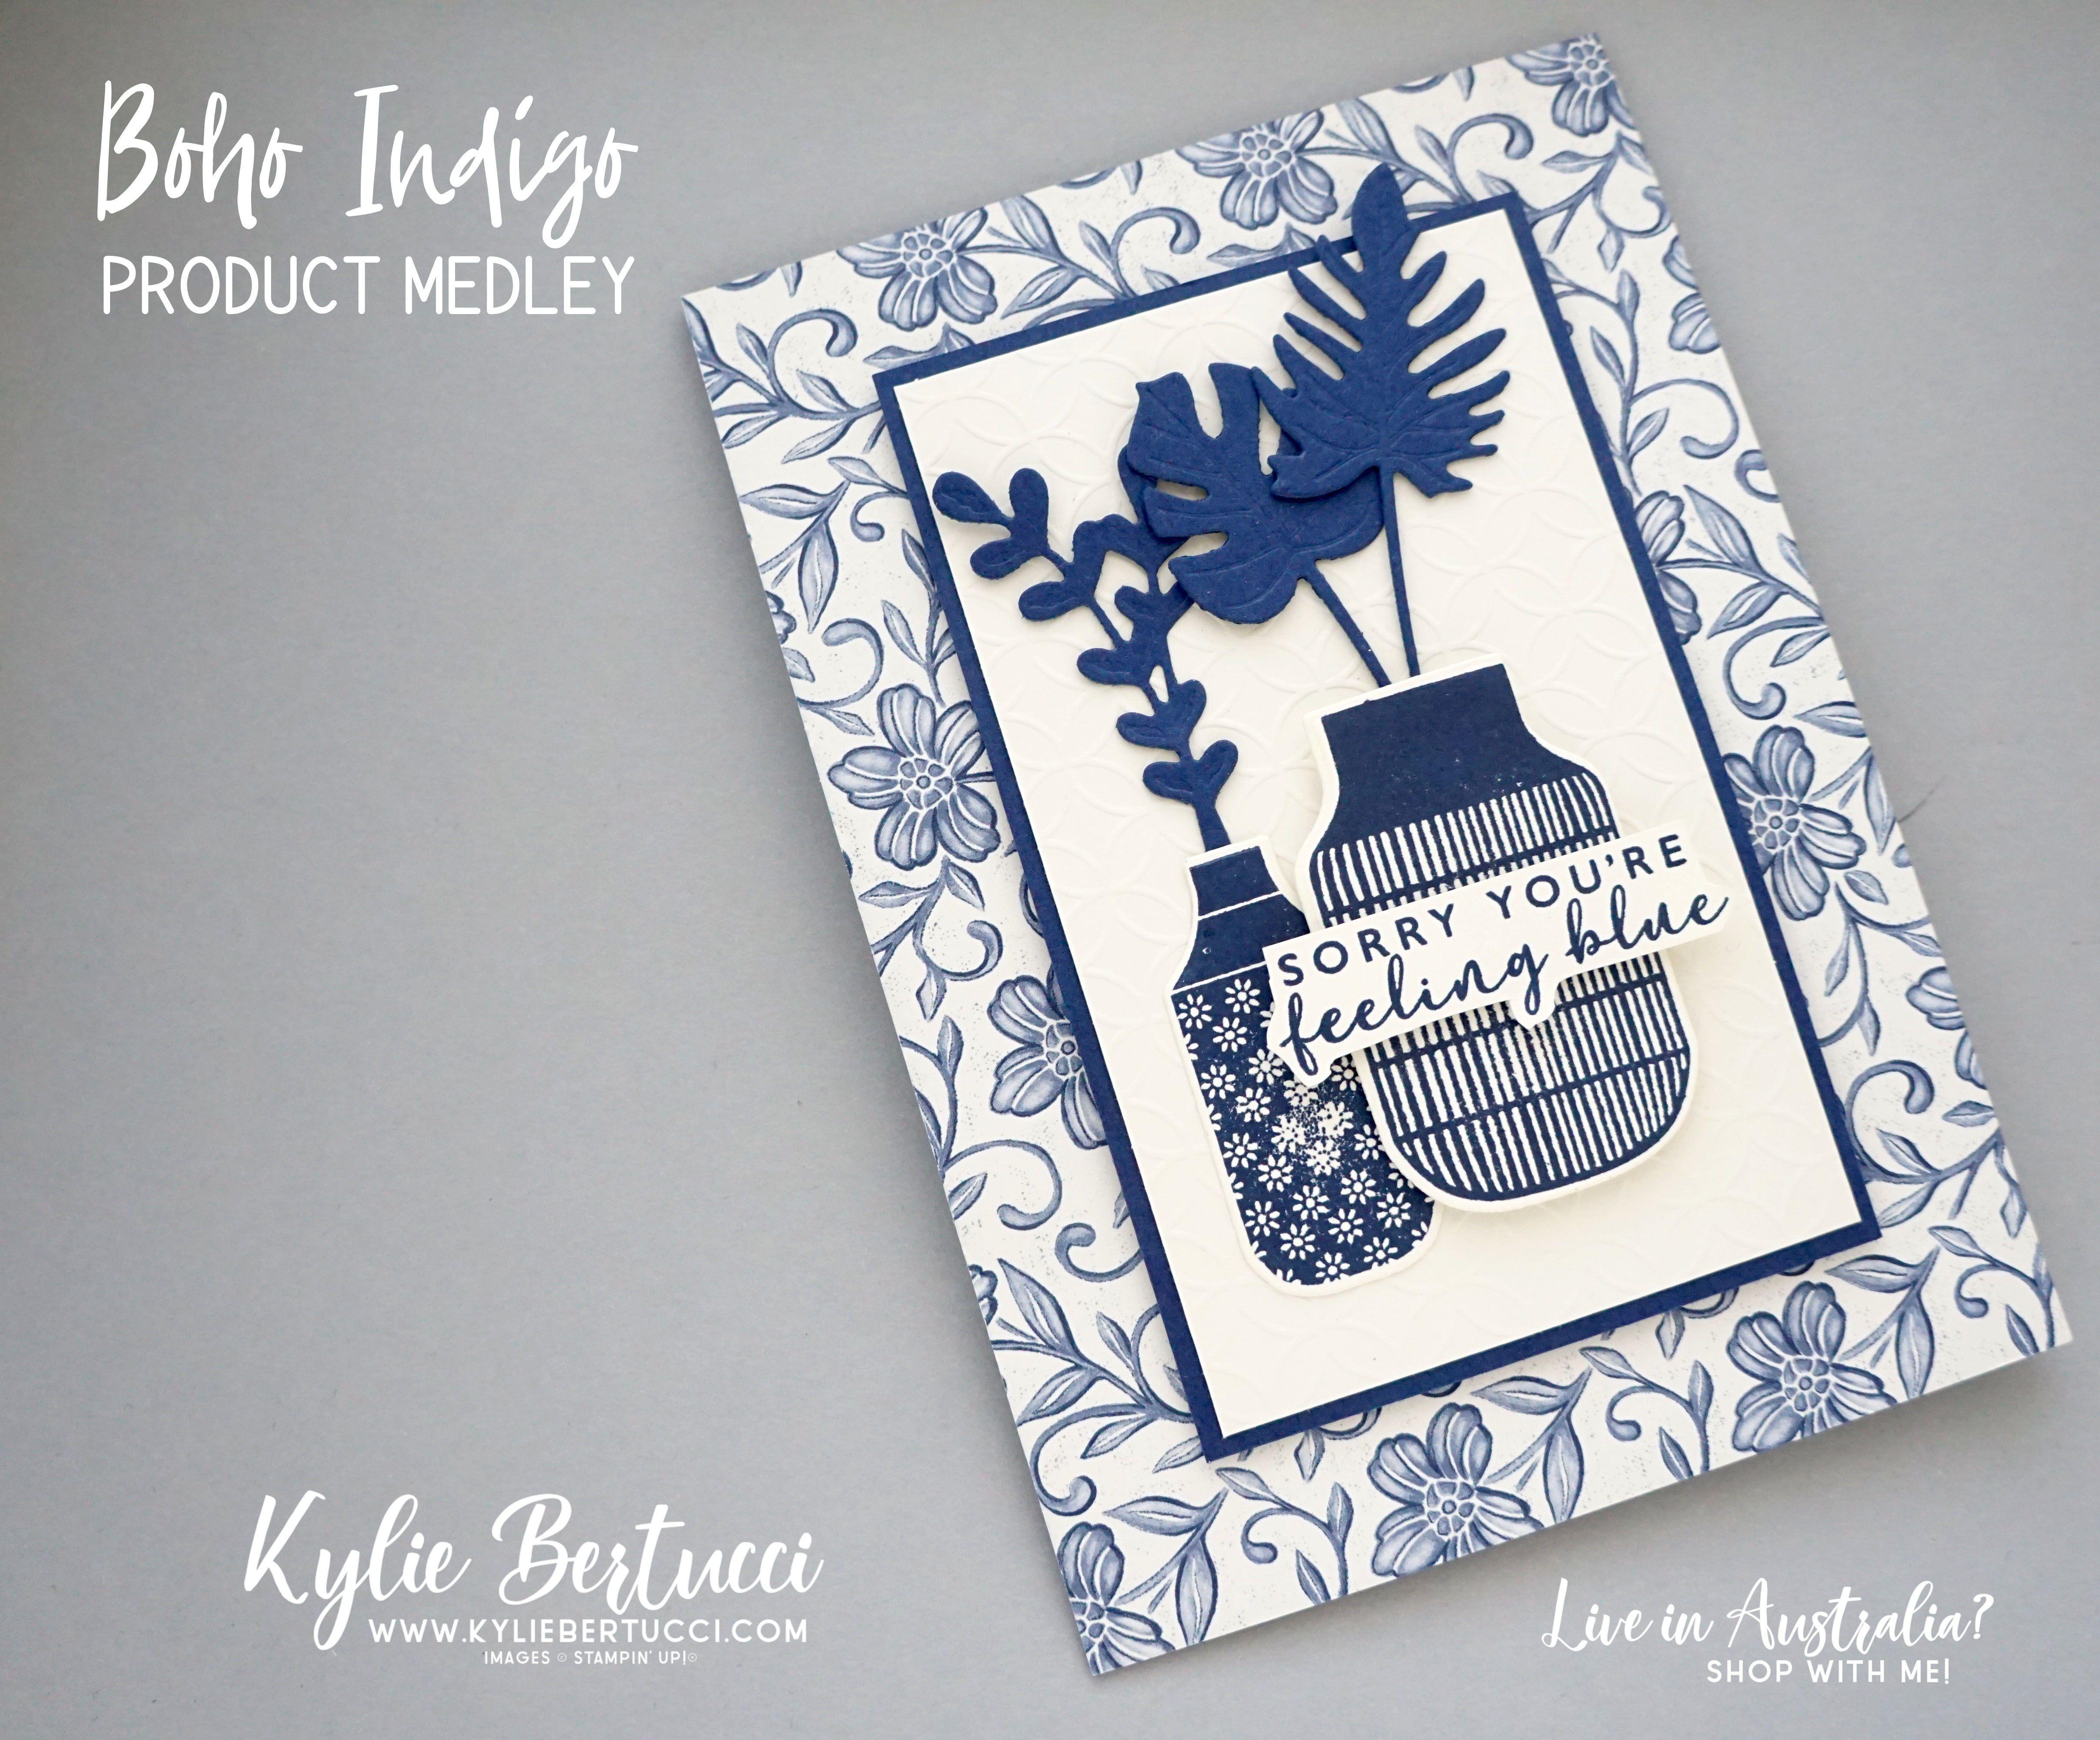 Boho Indigo Product Medley in 2020 Cards handmade, Love